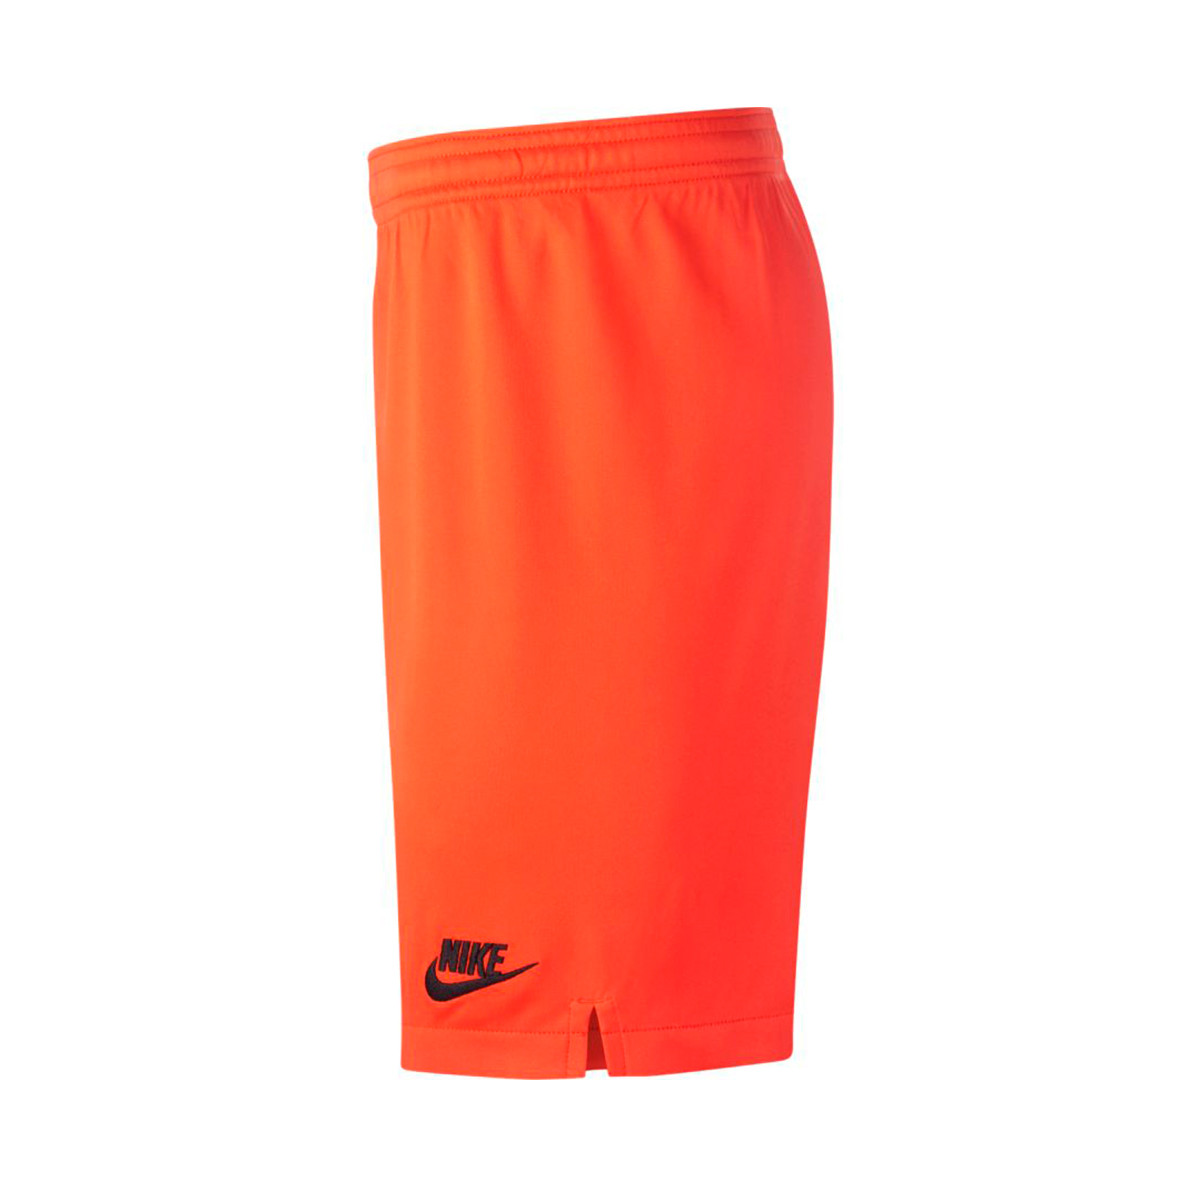 Shorts Nike Kids Tottenham Hotspur Breathe Stadium 2019 2020 Goalkeeper Team Orange Black Football Store Futbol Emotion